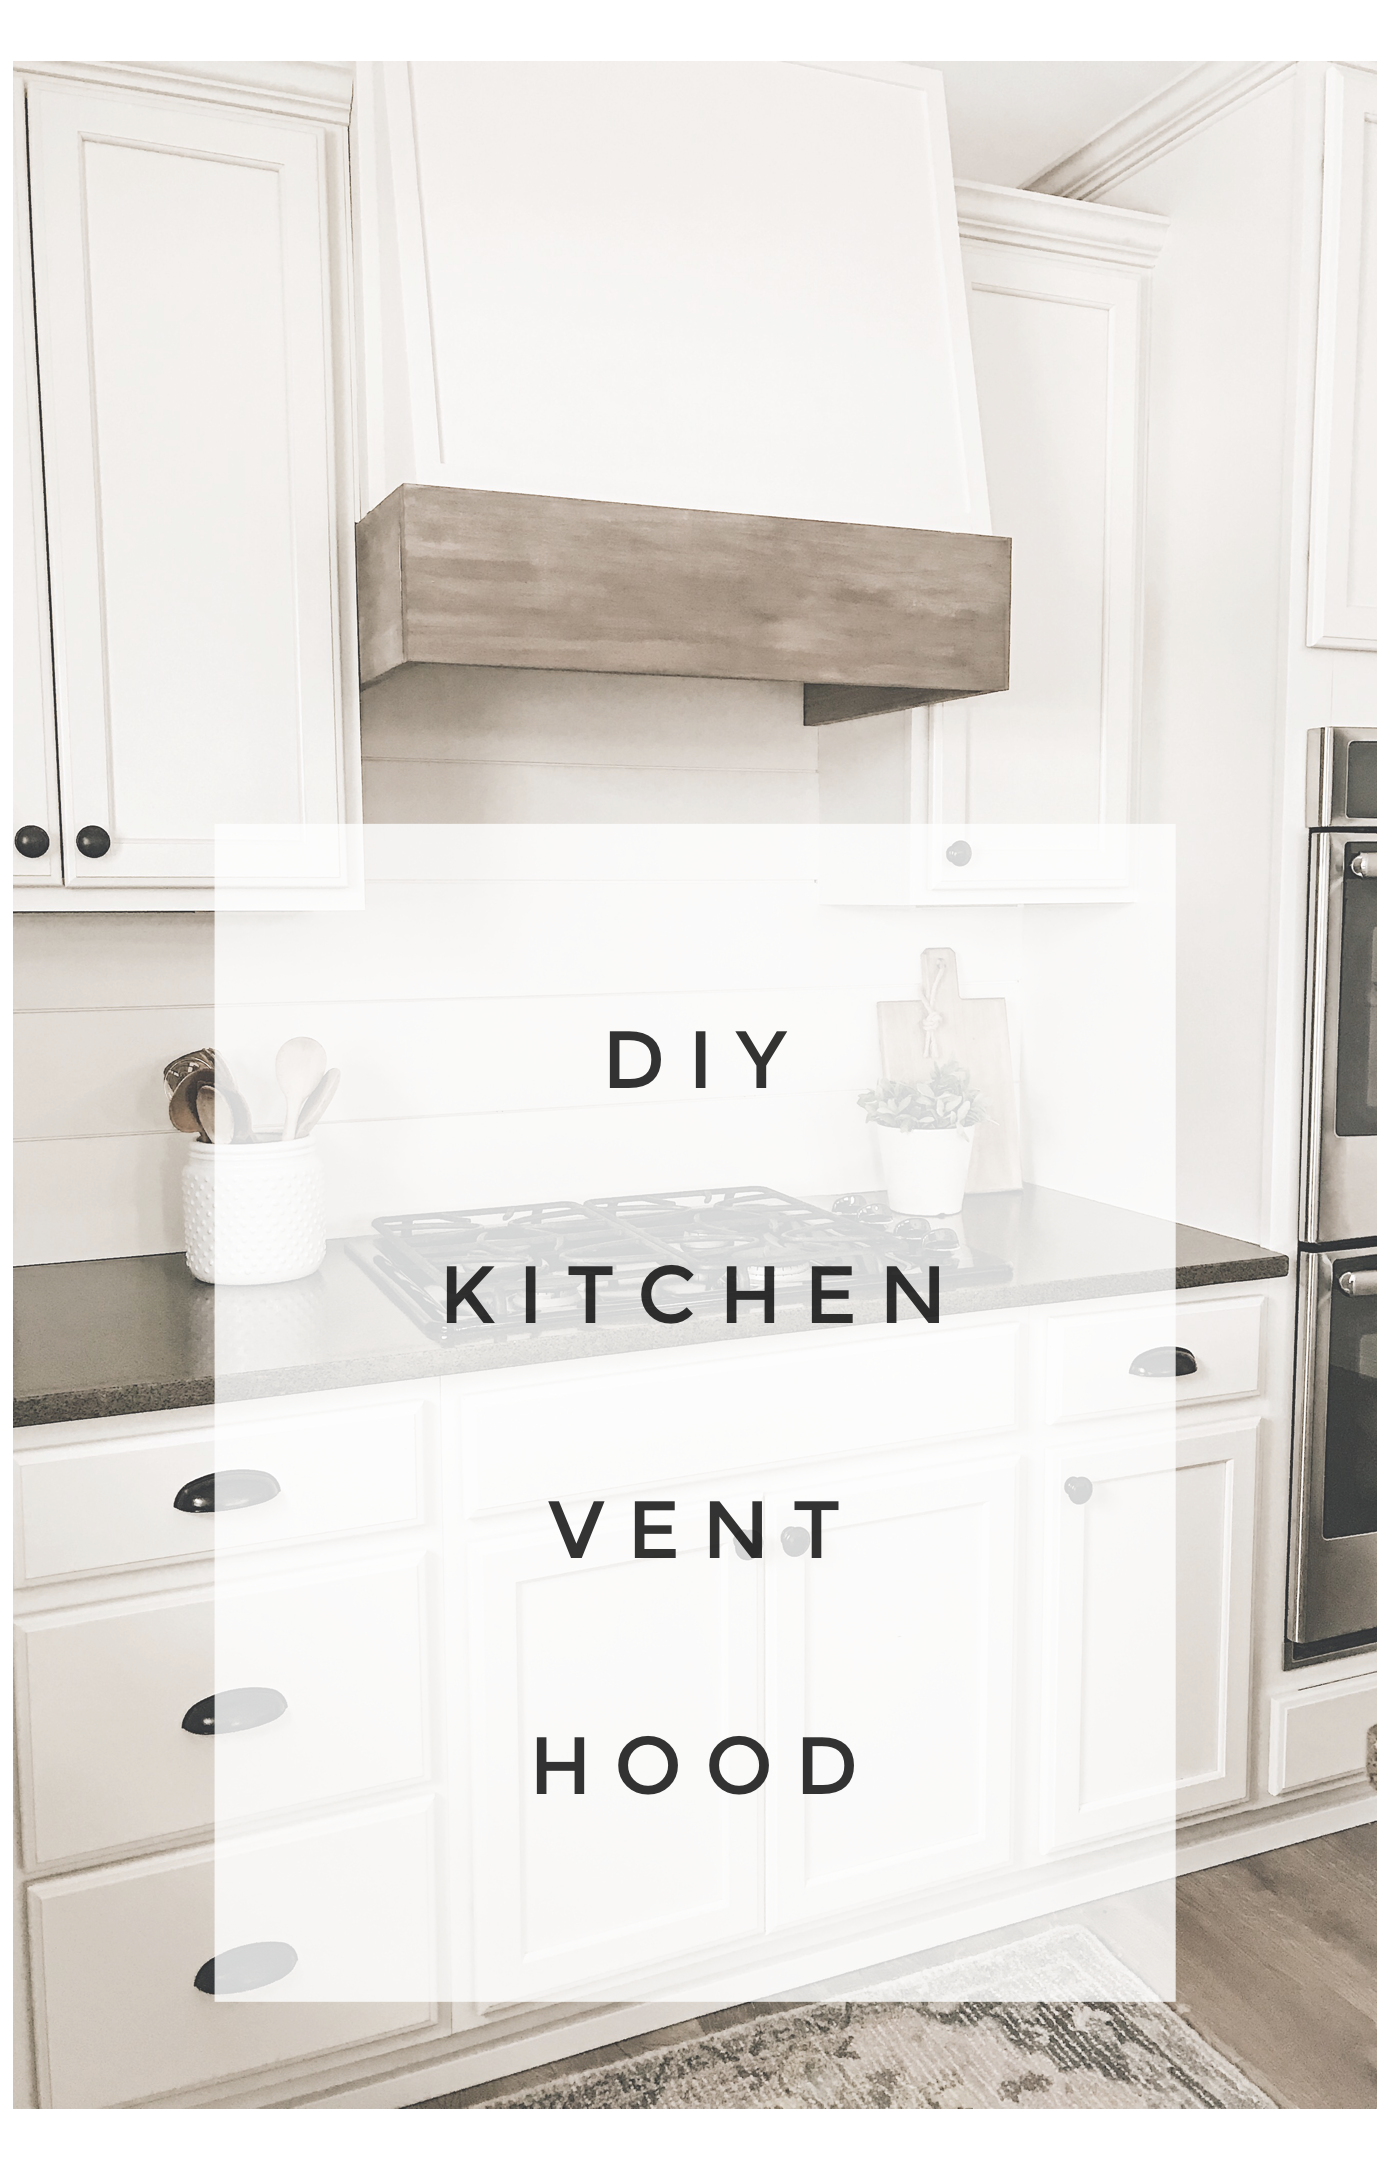 Pin By Katie Voss King On Leggett Kitchen Kitchen Vent Hood Kitchen Vent Kitchen Range Hood